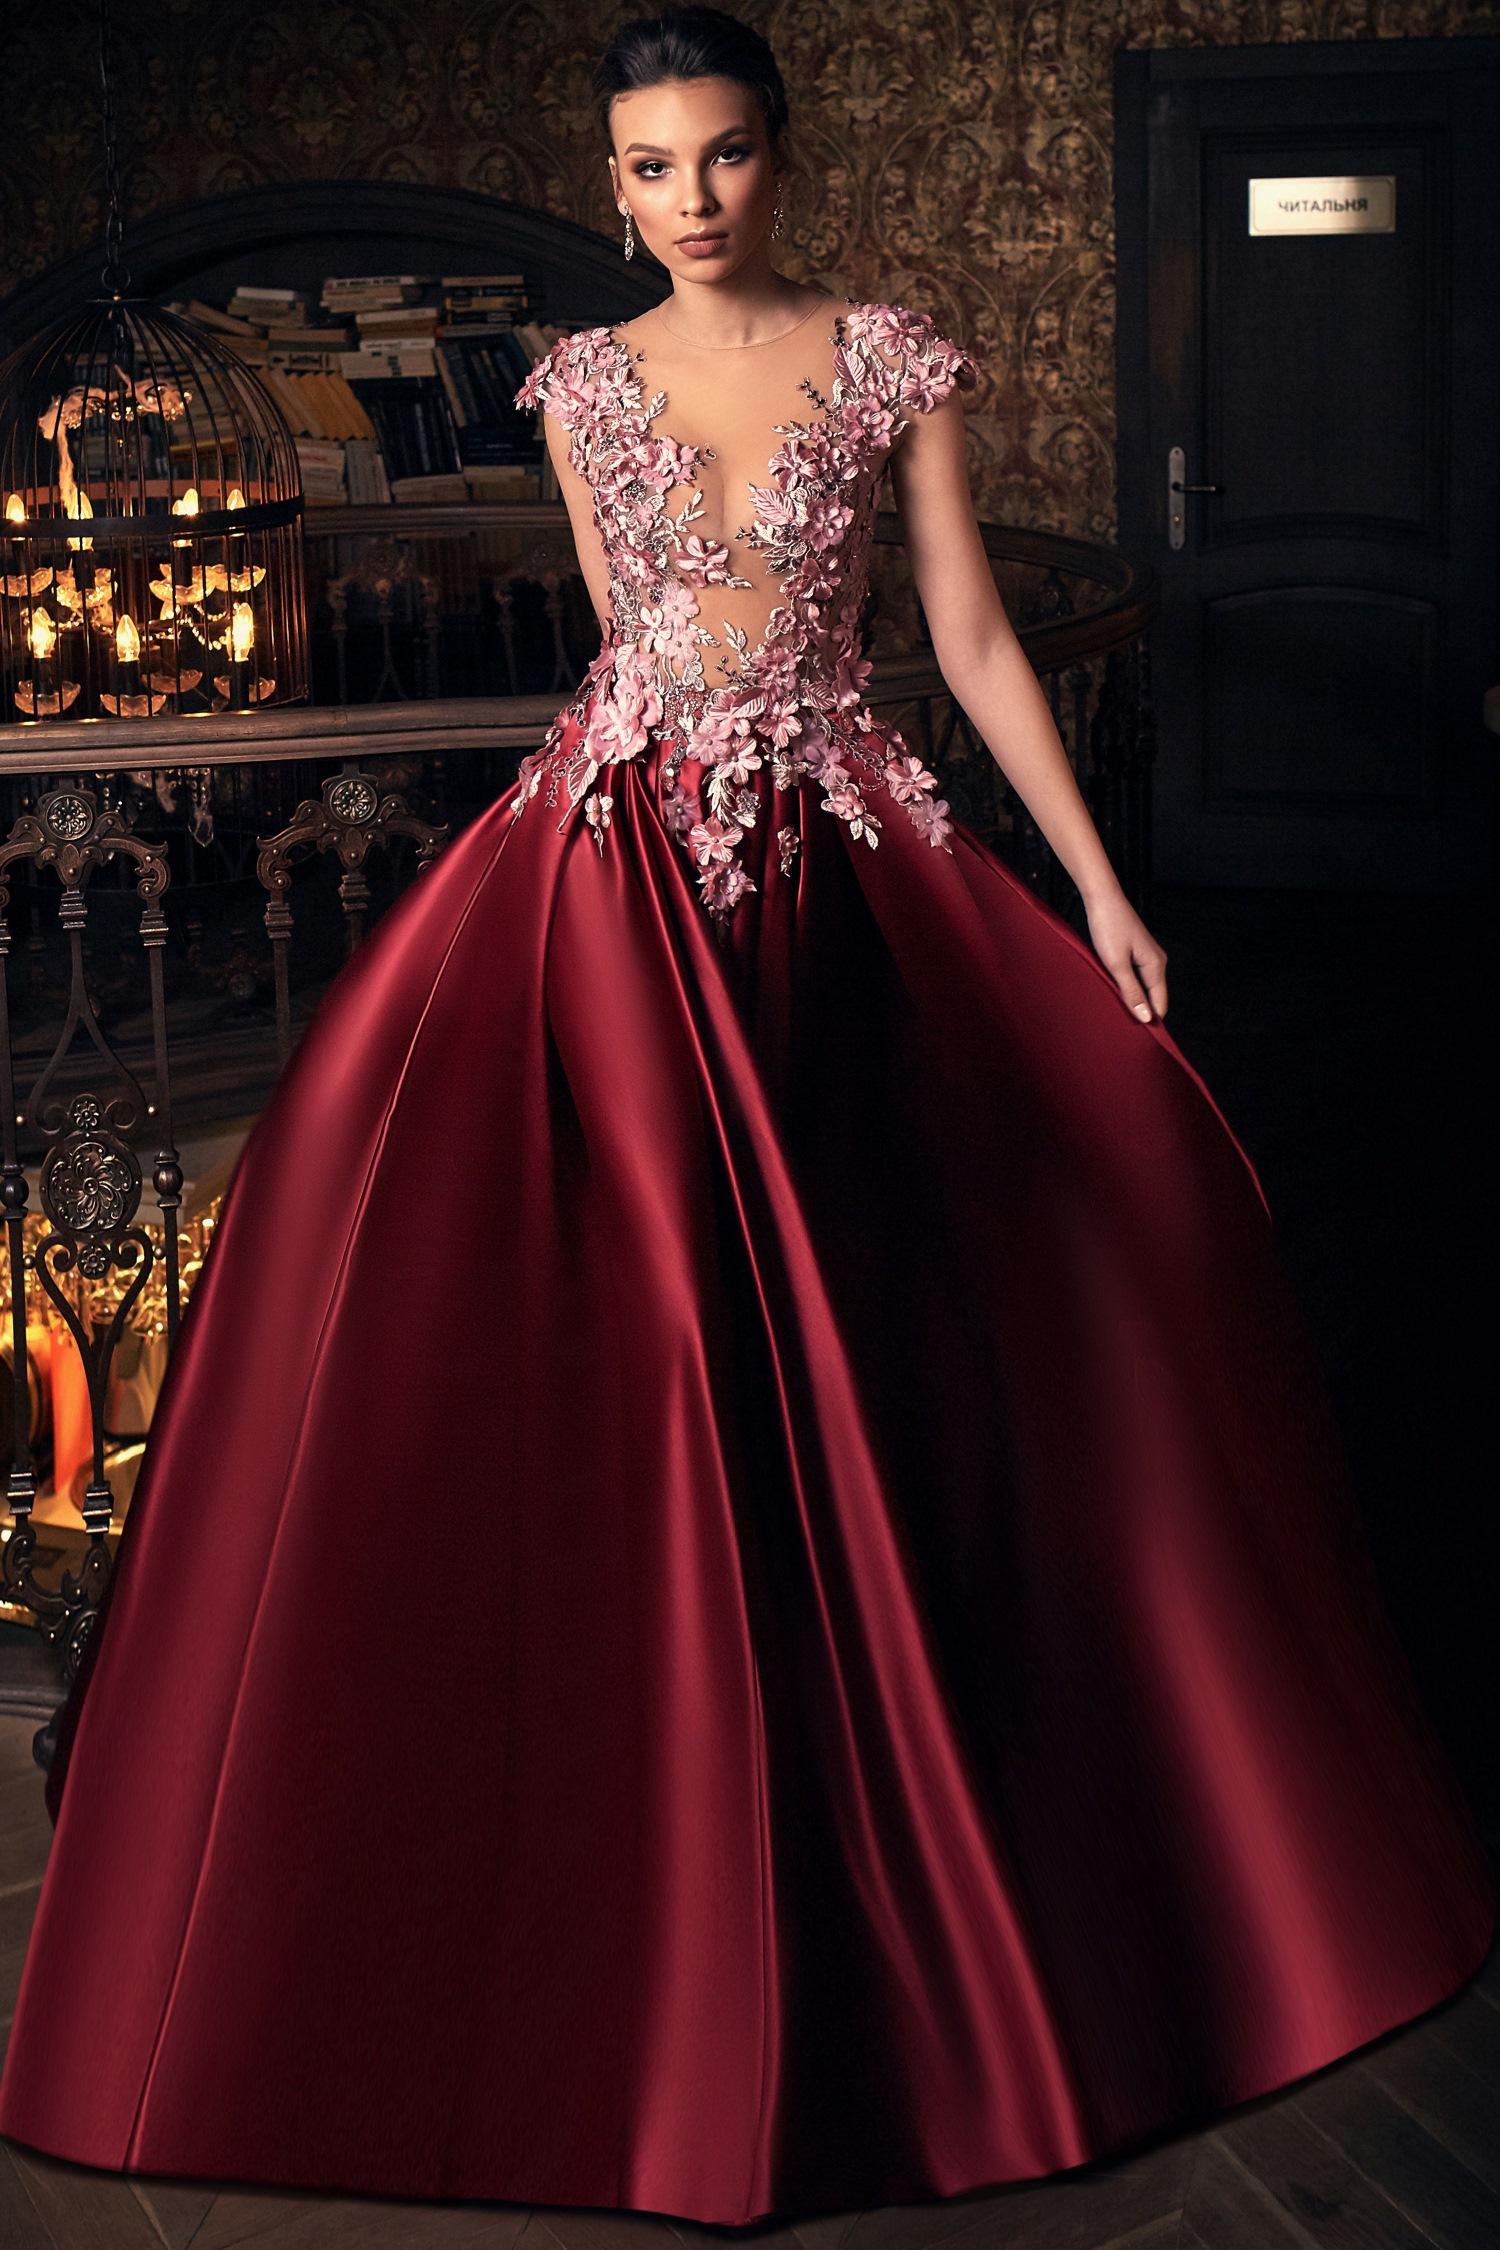 robe de soir e longue de luxe semi transparente rose et pourpre. Black Bedroom Furniture Sets. Home Design Ideas